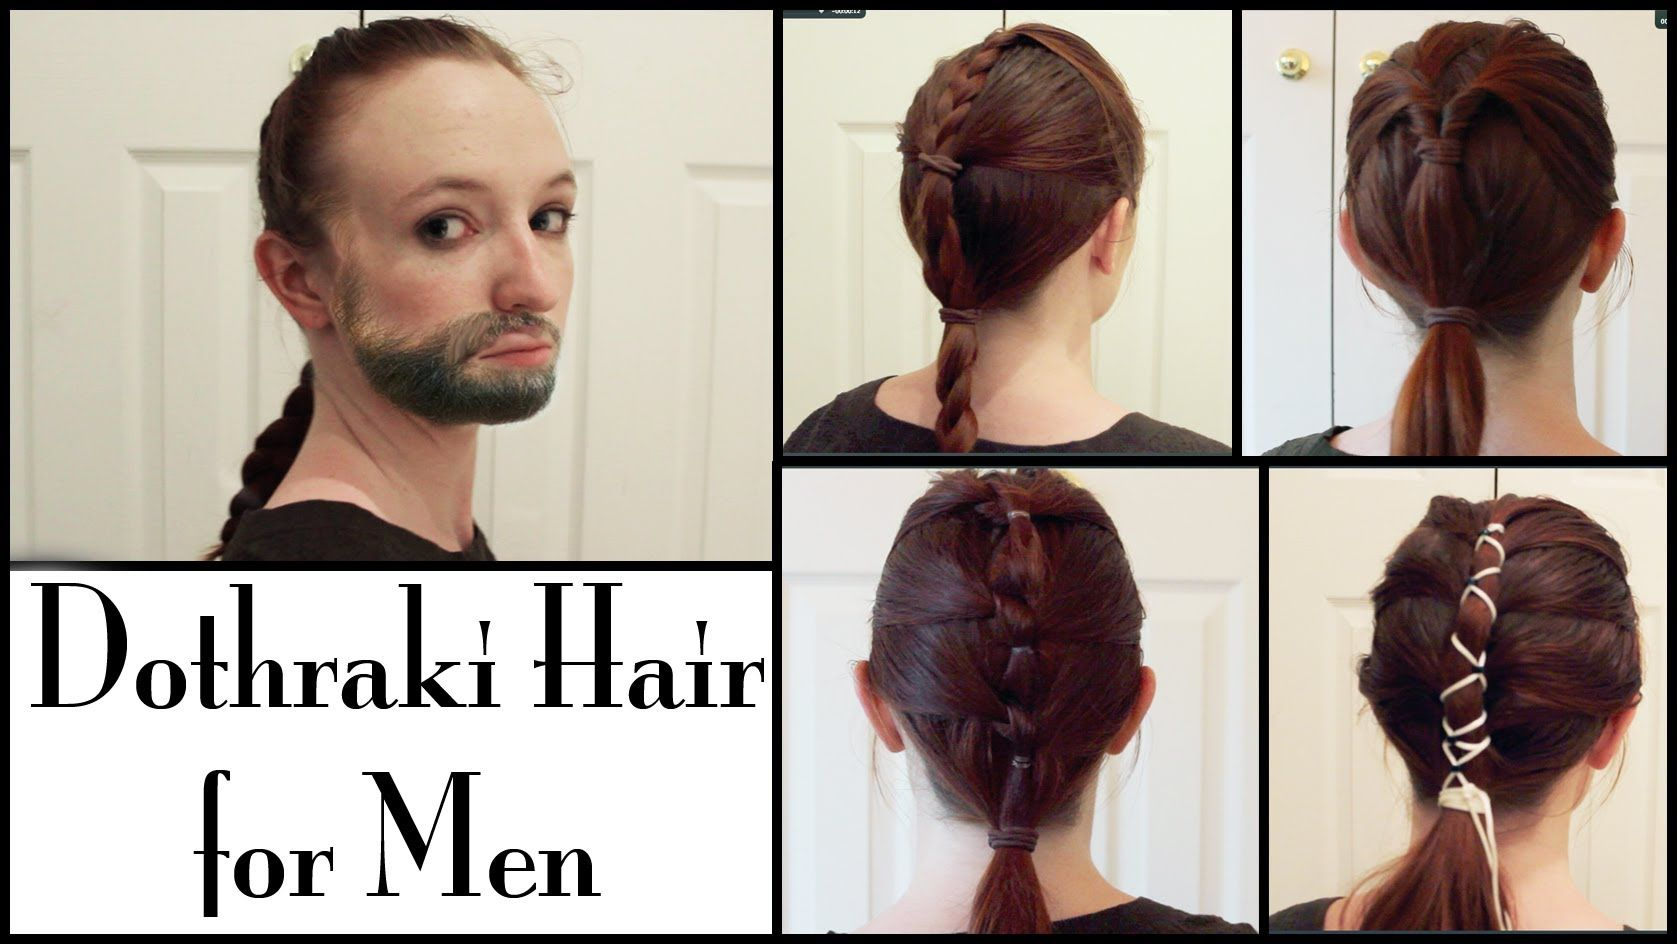 Surprising 1000 Images About Manbraid On Pinterest Short Hairstyles For Black Women Fulllsitofus